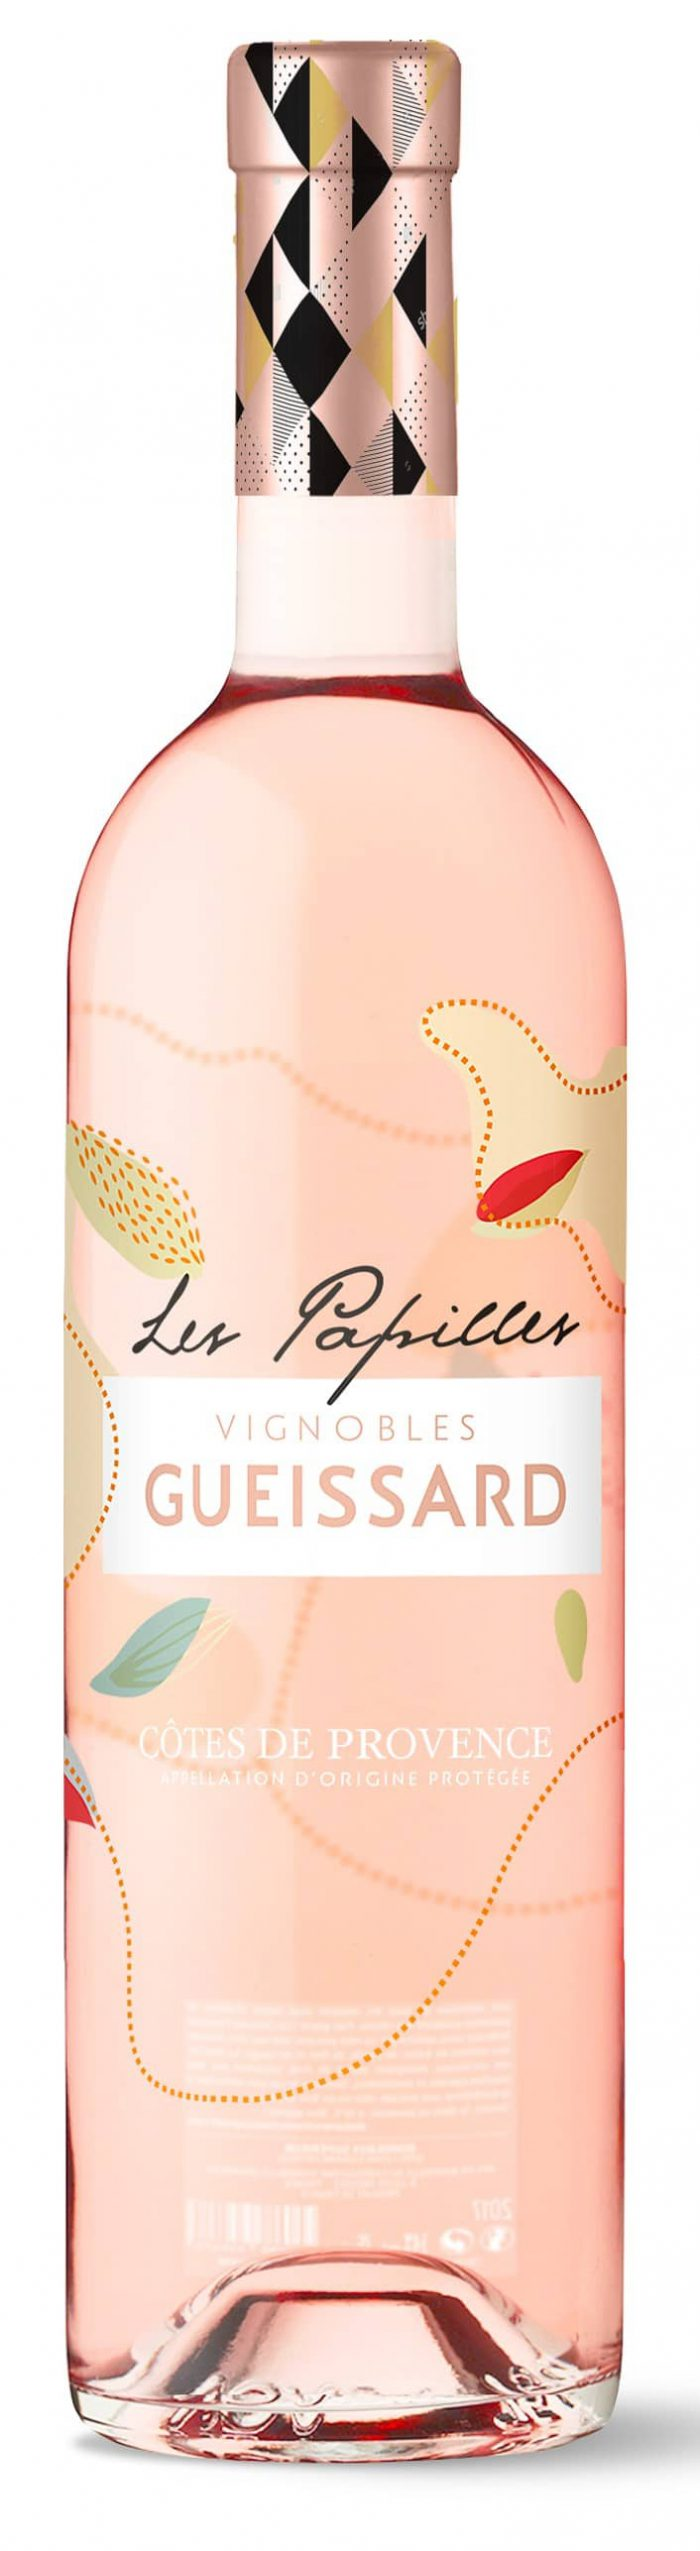 Vignobles Gueissard 'Les Papilles' | Frankrijk | gemaakt van de druif: Cinsault, Grenache Noir, Mourvèdre, Syrah, Vermentino